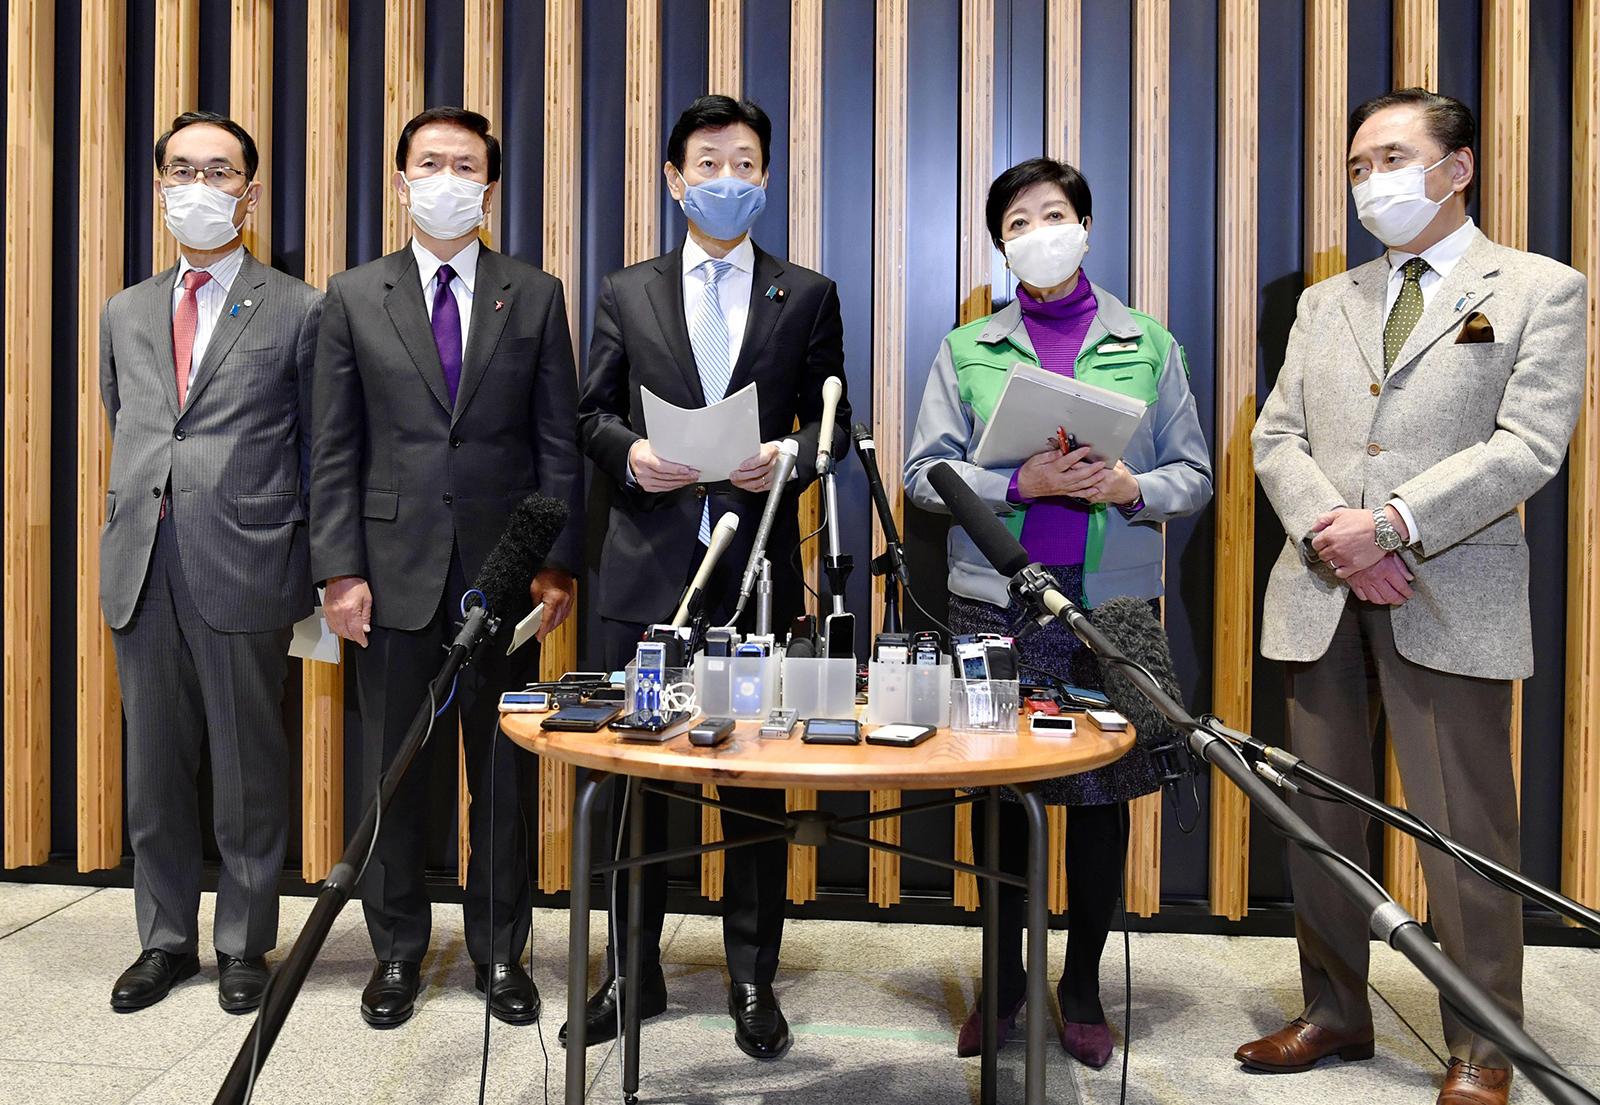 From left to right, Saitama Gov. Motohiro Ono, Chiba Gov. Kensaku Morita, Yasutoshi Nishimura, Japan's minister in charge of coronavirus response, Tokyo Gov. and Kanagawa Gov. Yuji Kuroiwa meet the press after their meeting in Tokyo, on January 2.